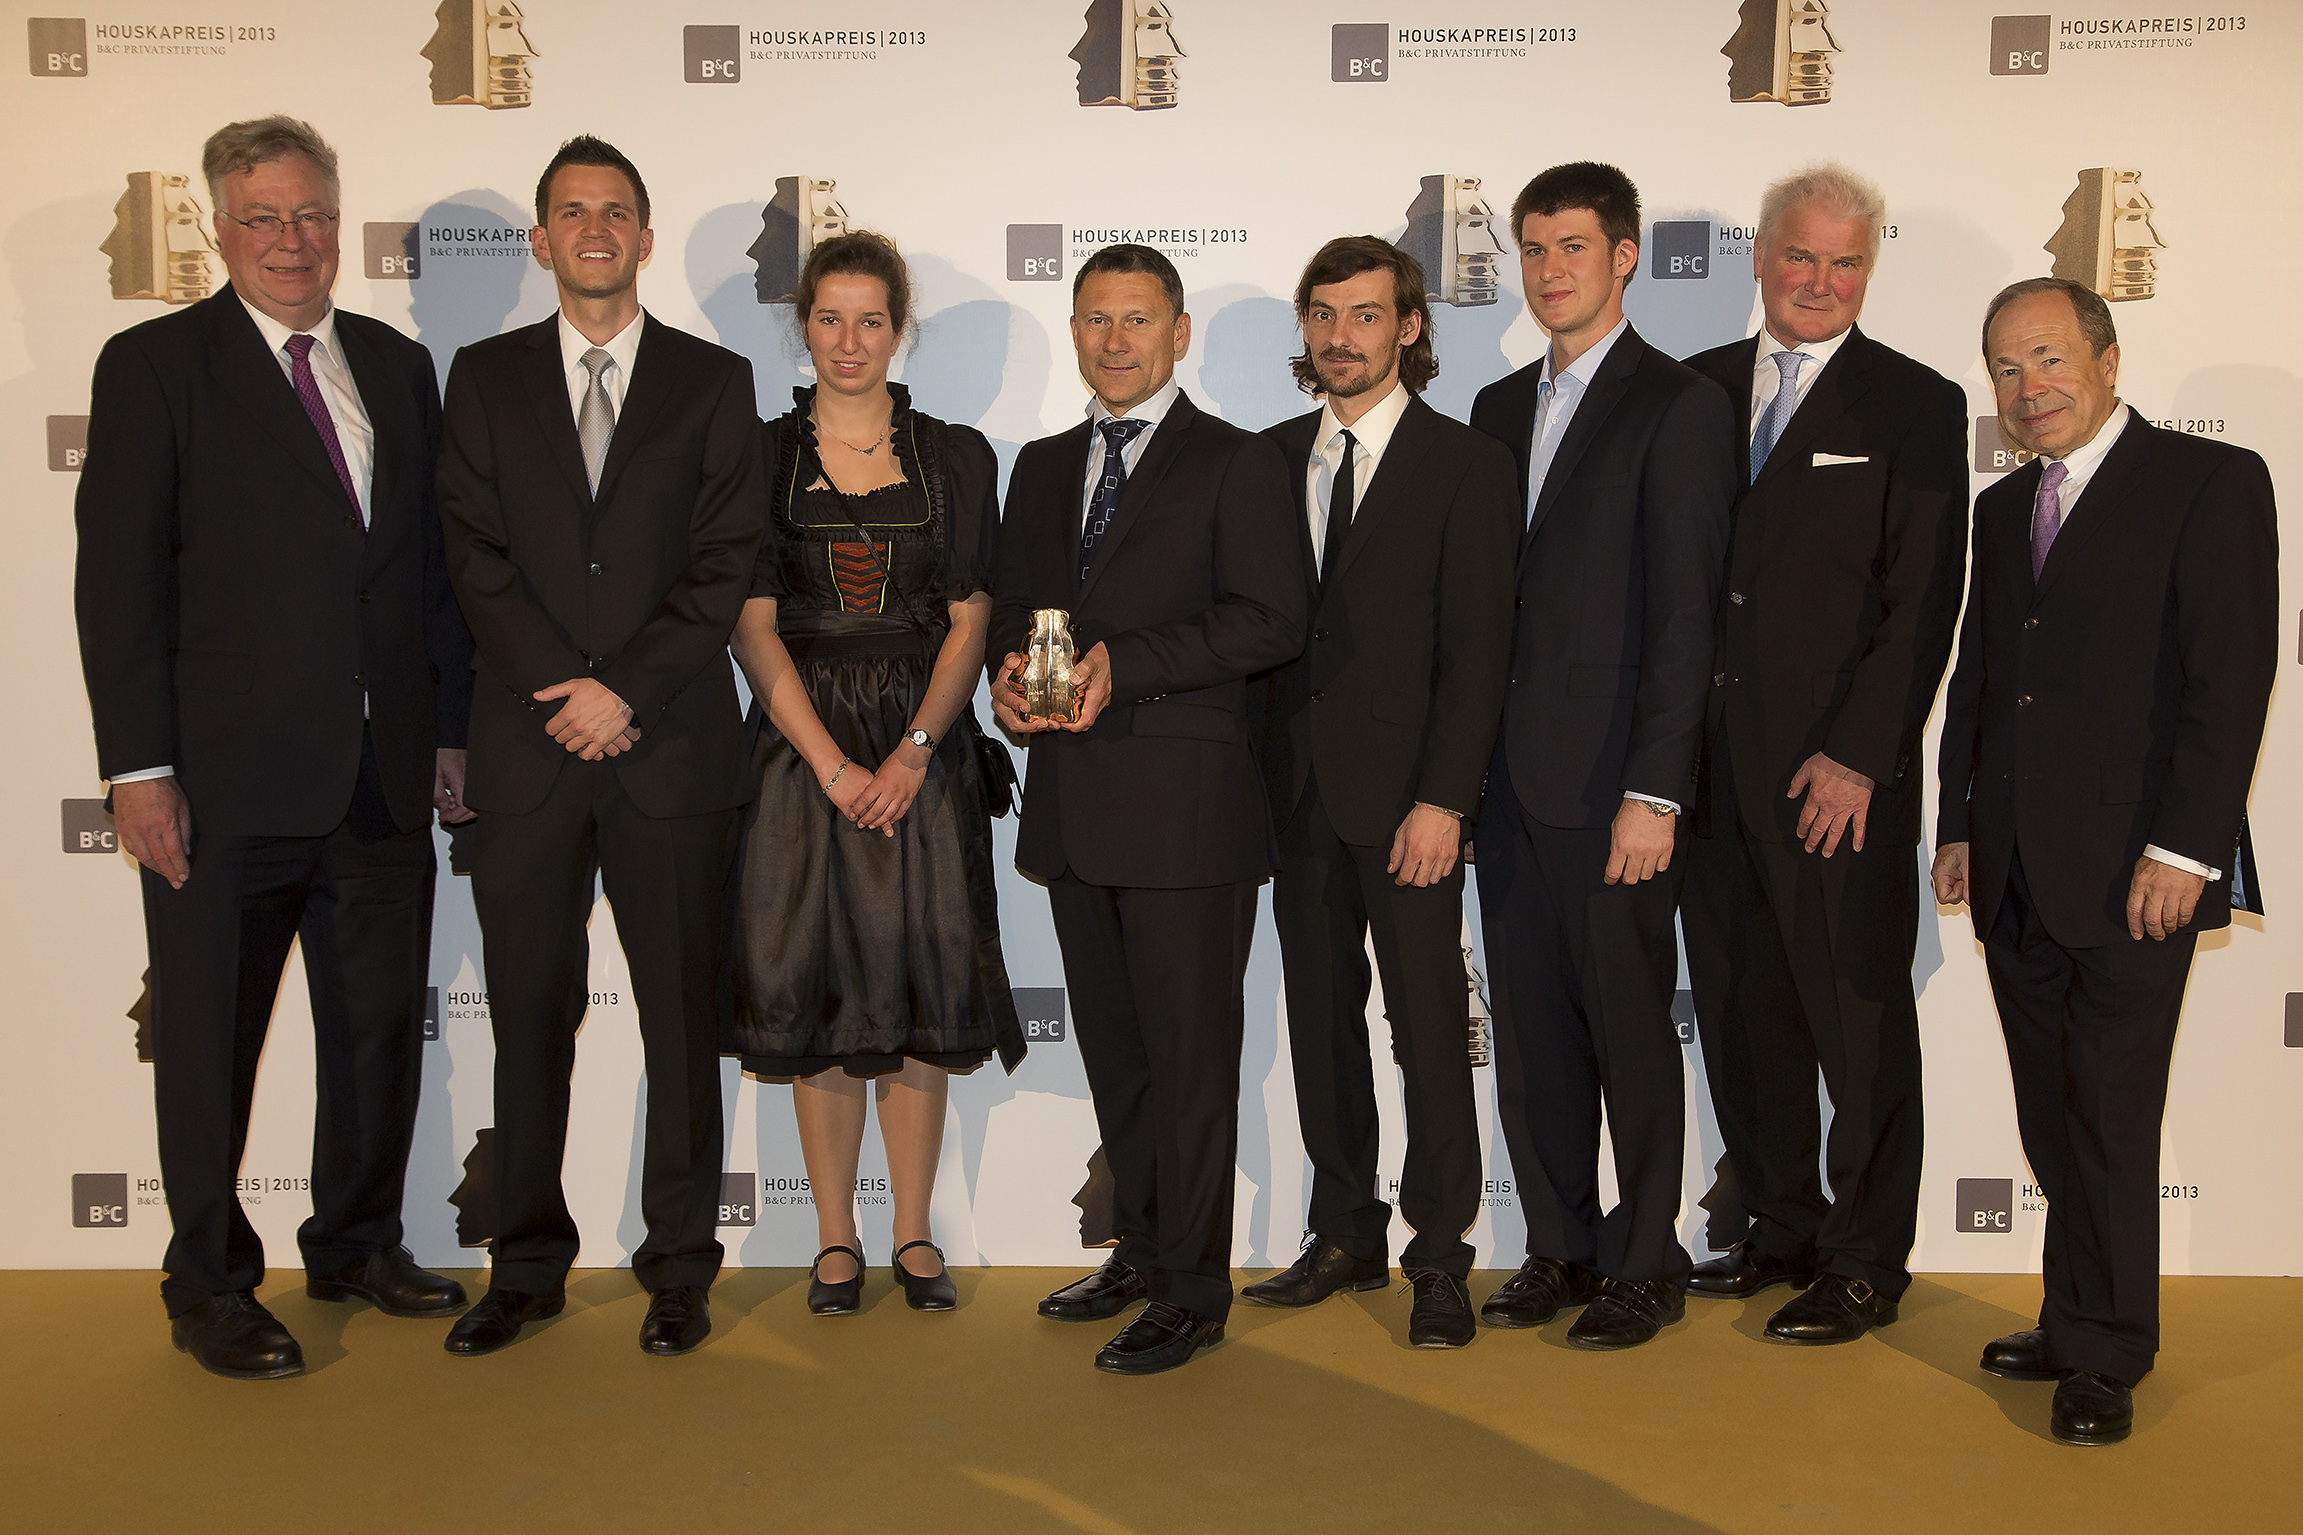 1. Platz Houskapreis 2013